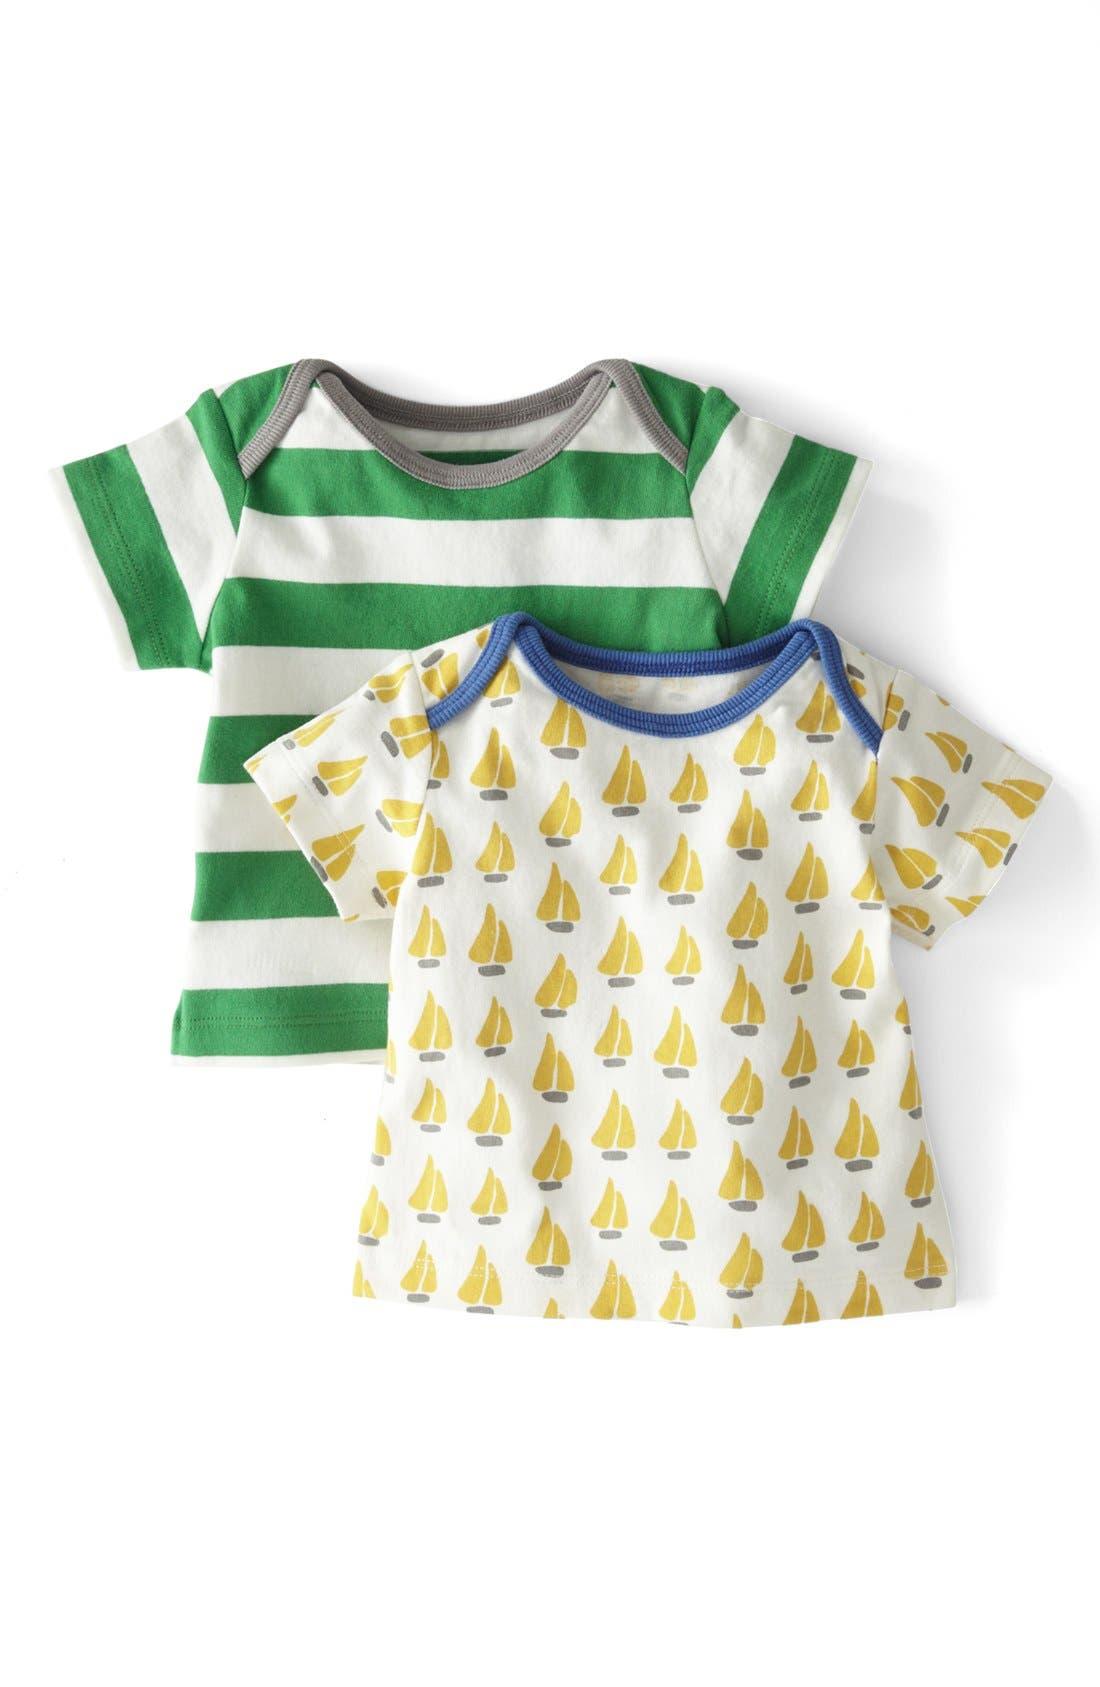 Main Image - Mini Boden 'Nautical' T-Shirt (2-Pack) (Baby Boys)